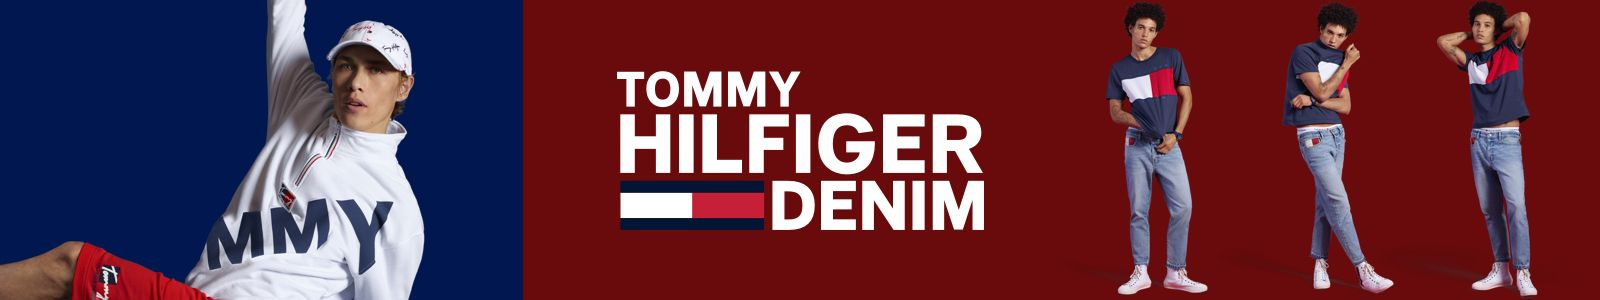 Tommy Hilfiger Denim